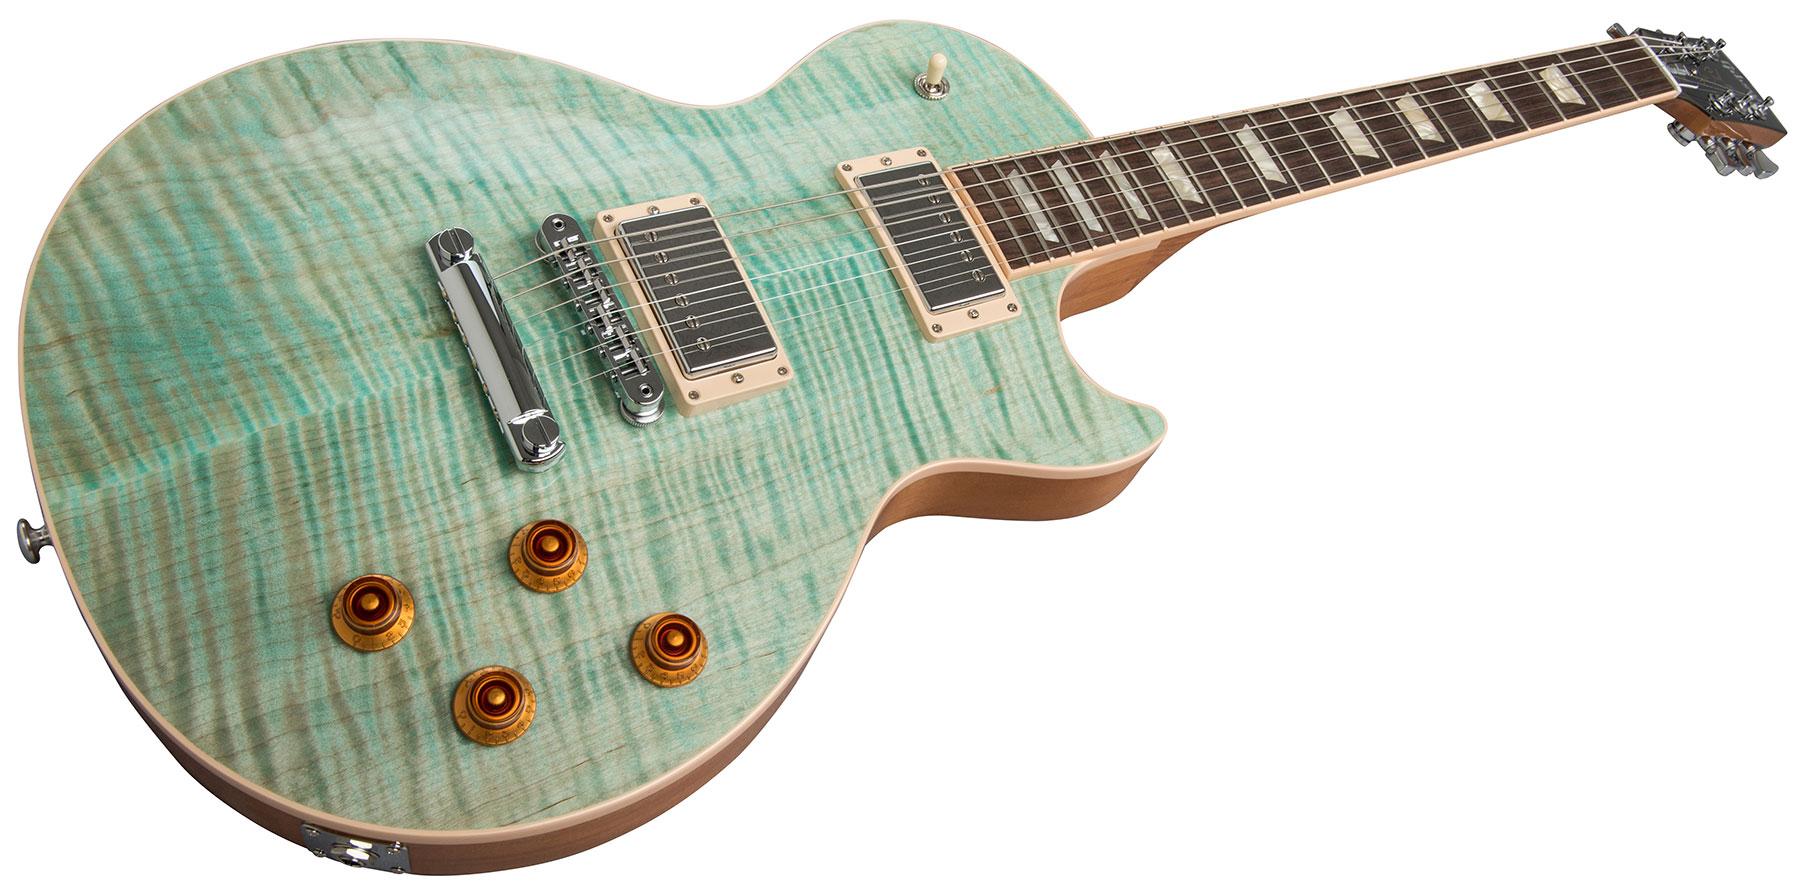 Gibson Les Paul Seafoam Green : gibson les paul standard 2019 seafoam green solid body electric guitar green star 39 s music ~ Hamham.info Haus und Dekorationen